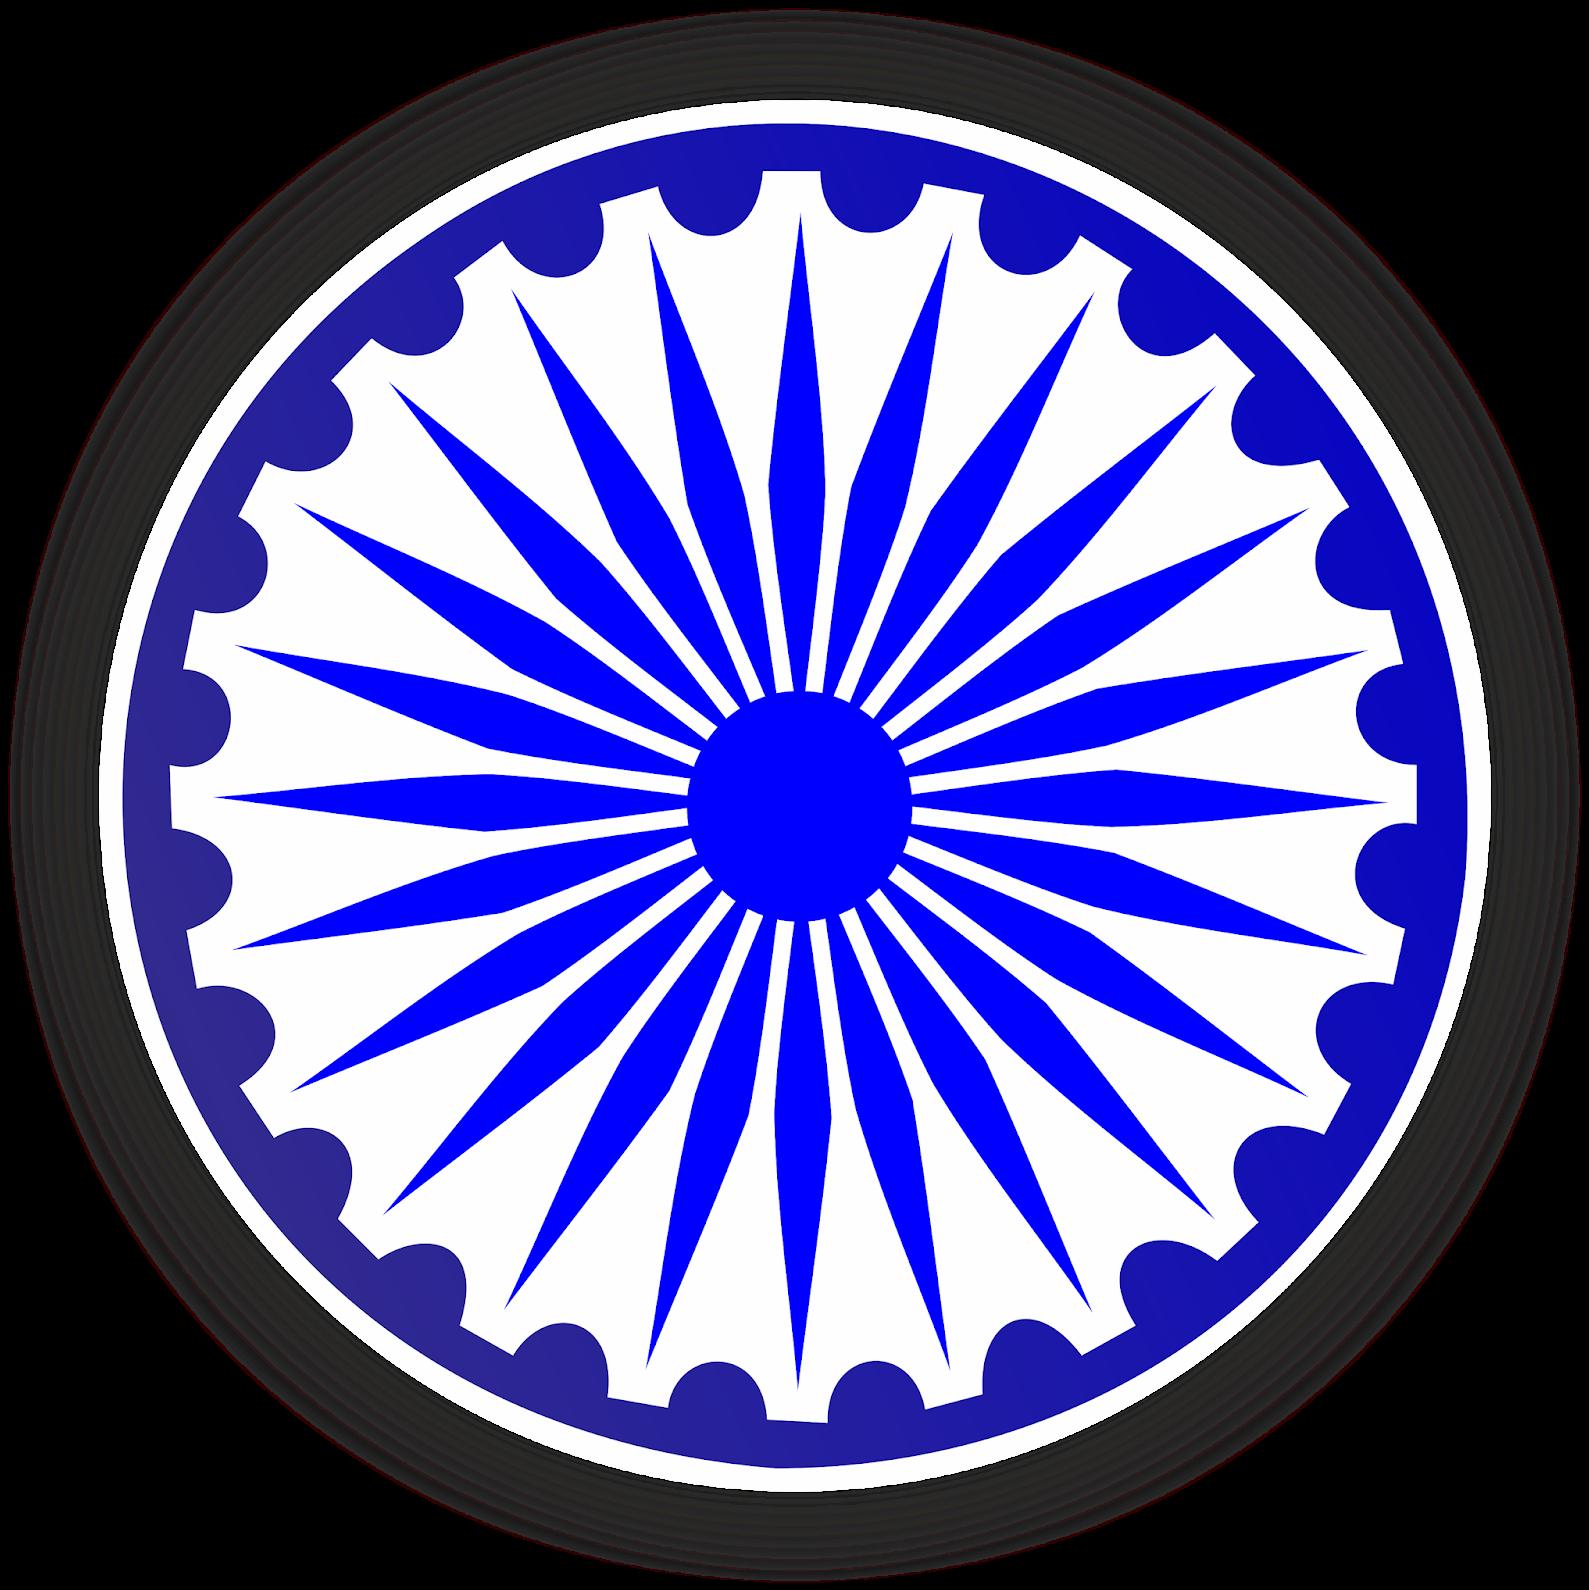 Ashok Chakra Image In Png File.